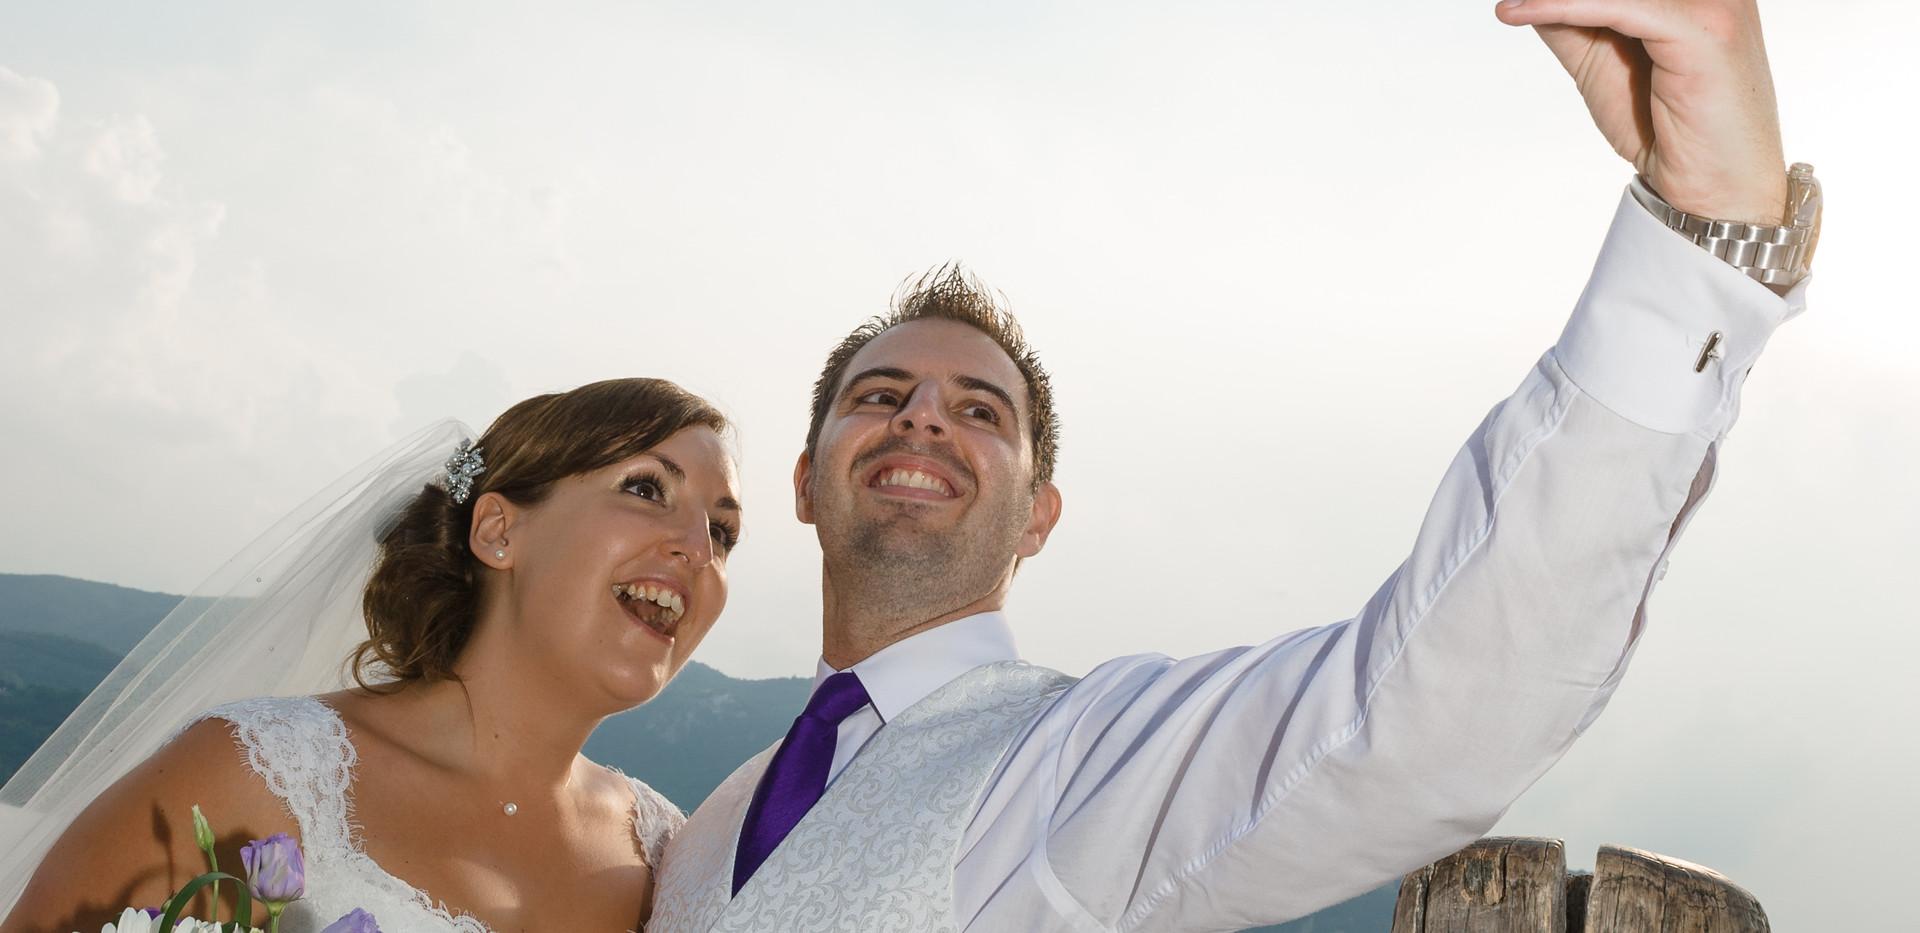 10. Selfie time! Villa Bossi wedding ven